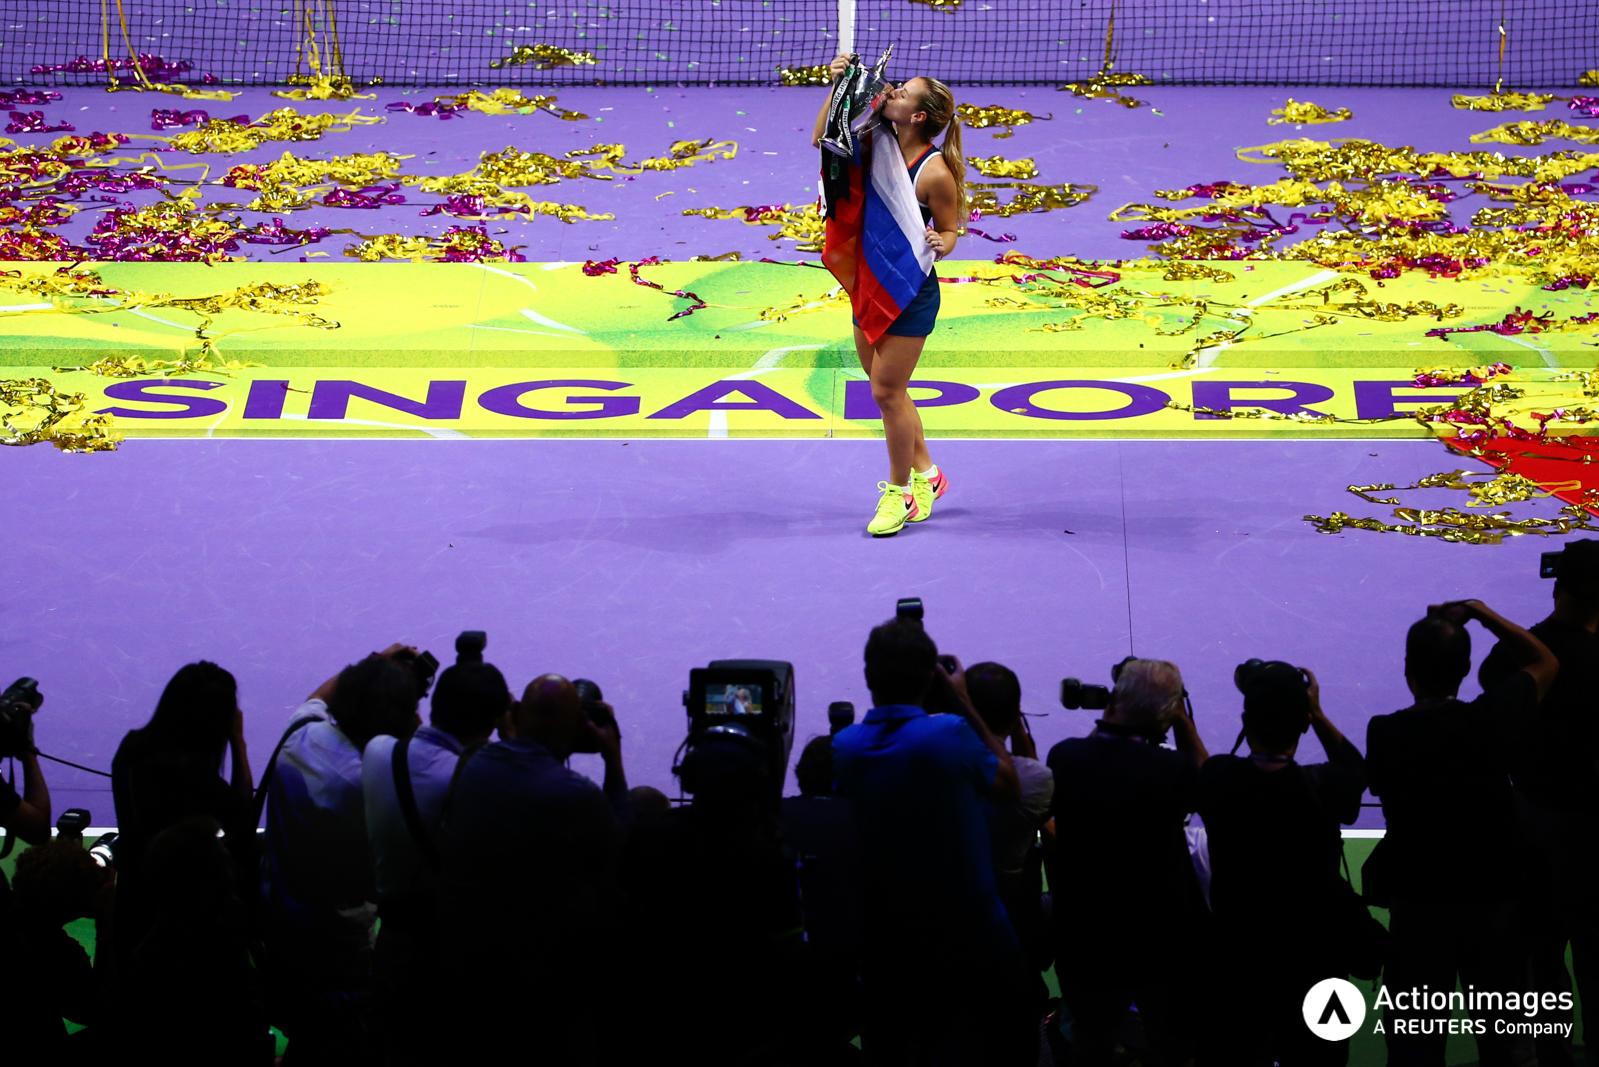 Tennis - BNP Paribas WTA Finals - Singapore Indoor Stadium - 30/10/16 Slovakia's Dominika Cibulkova celebrates winning the final with the Billie Jean King Trophy Mandatory Credit: Action Images / Yong Teck Lim Livepic